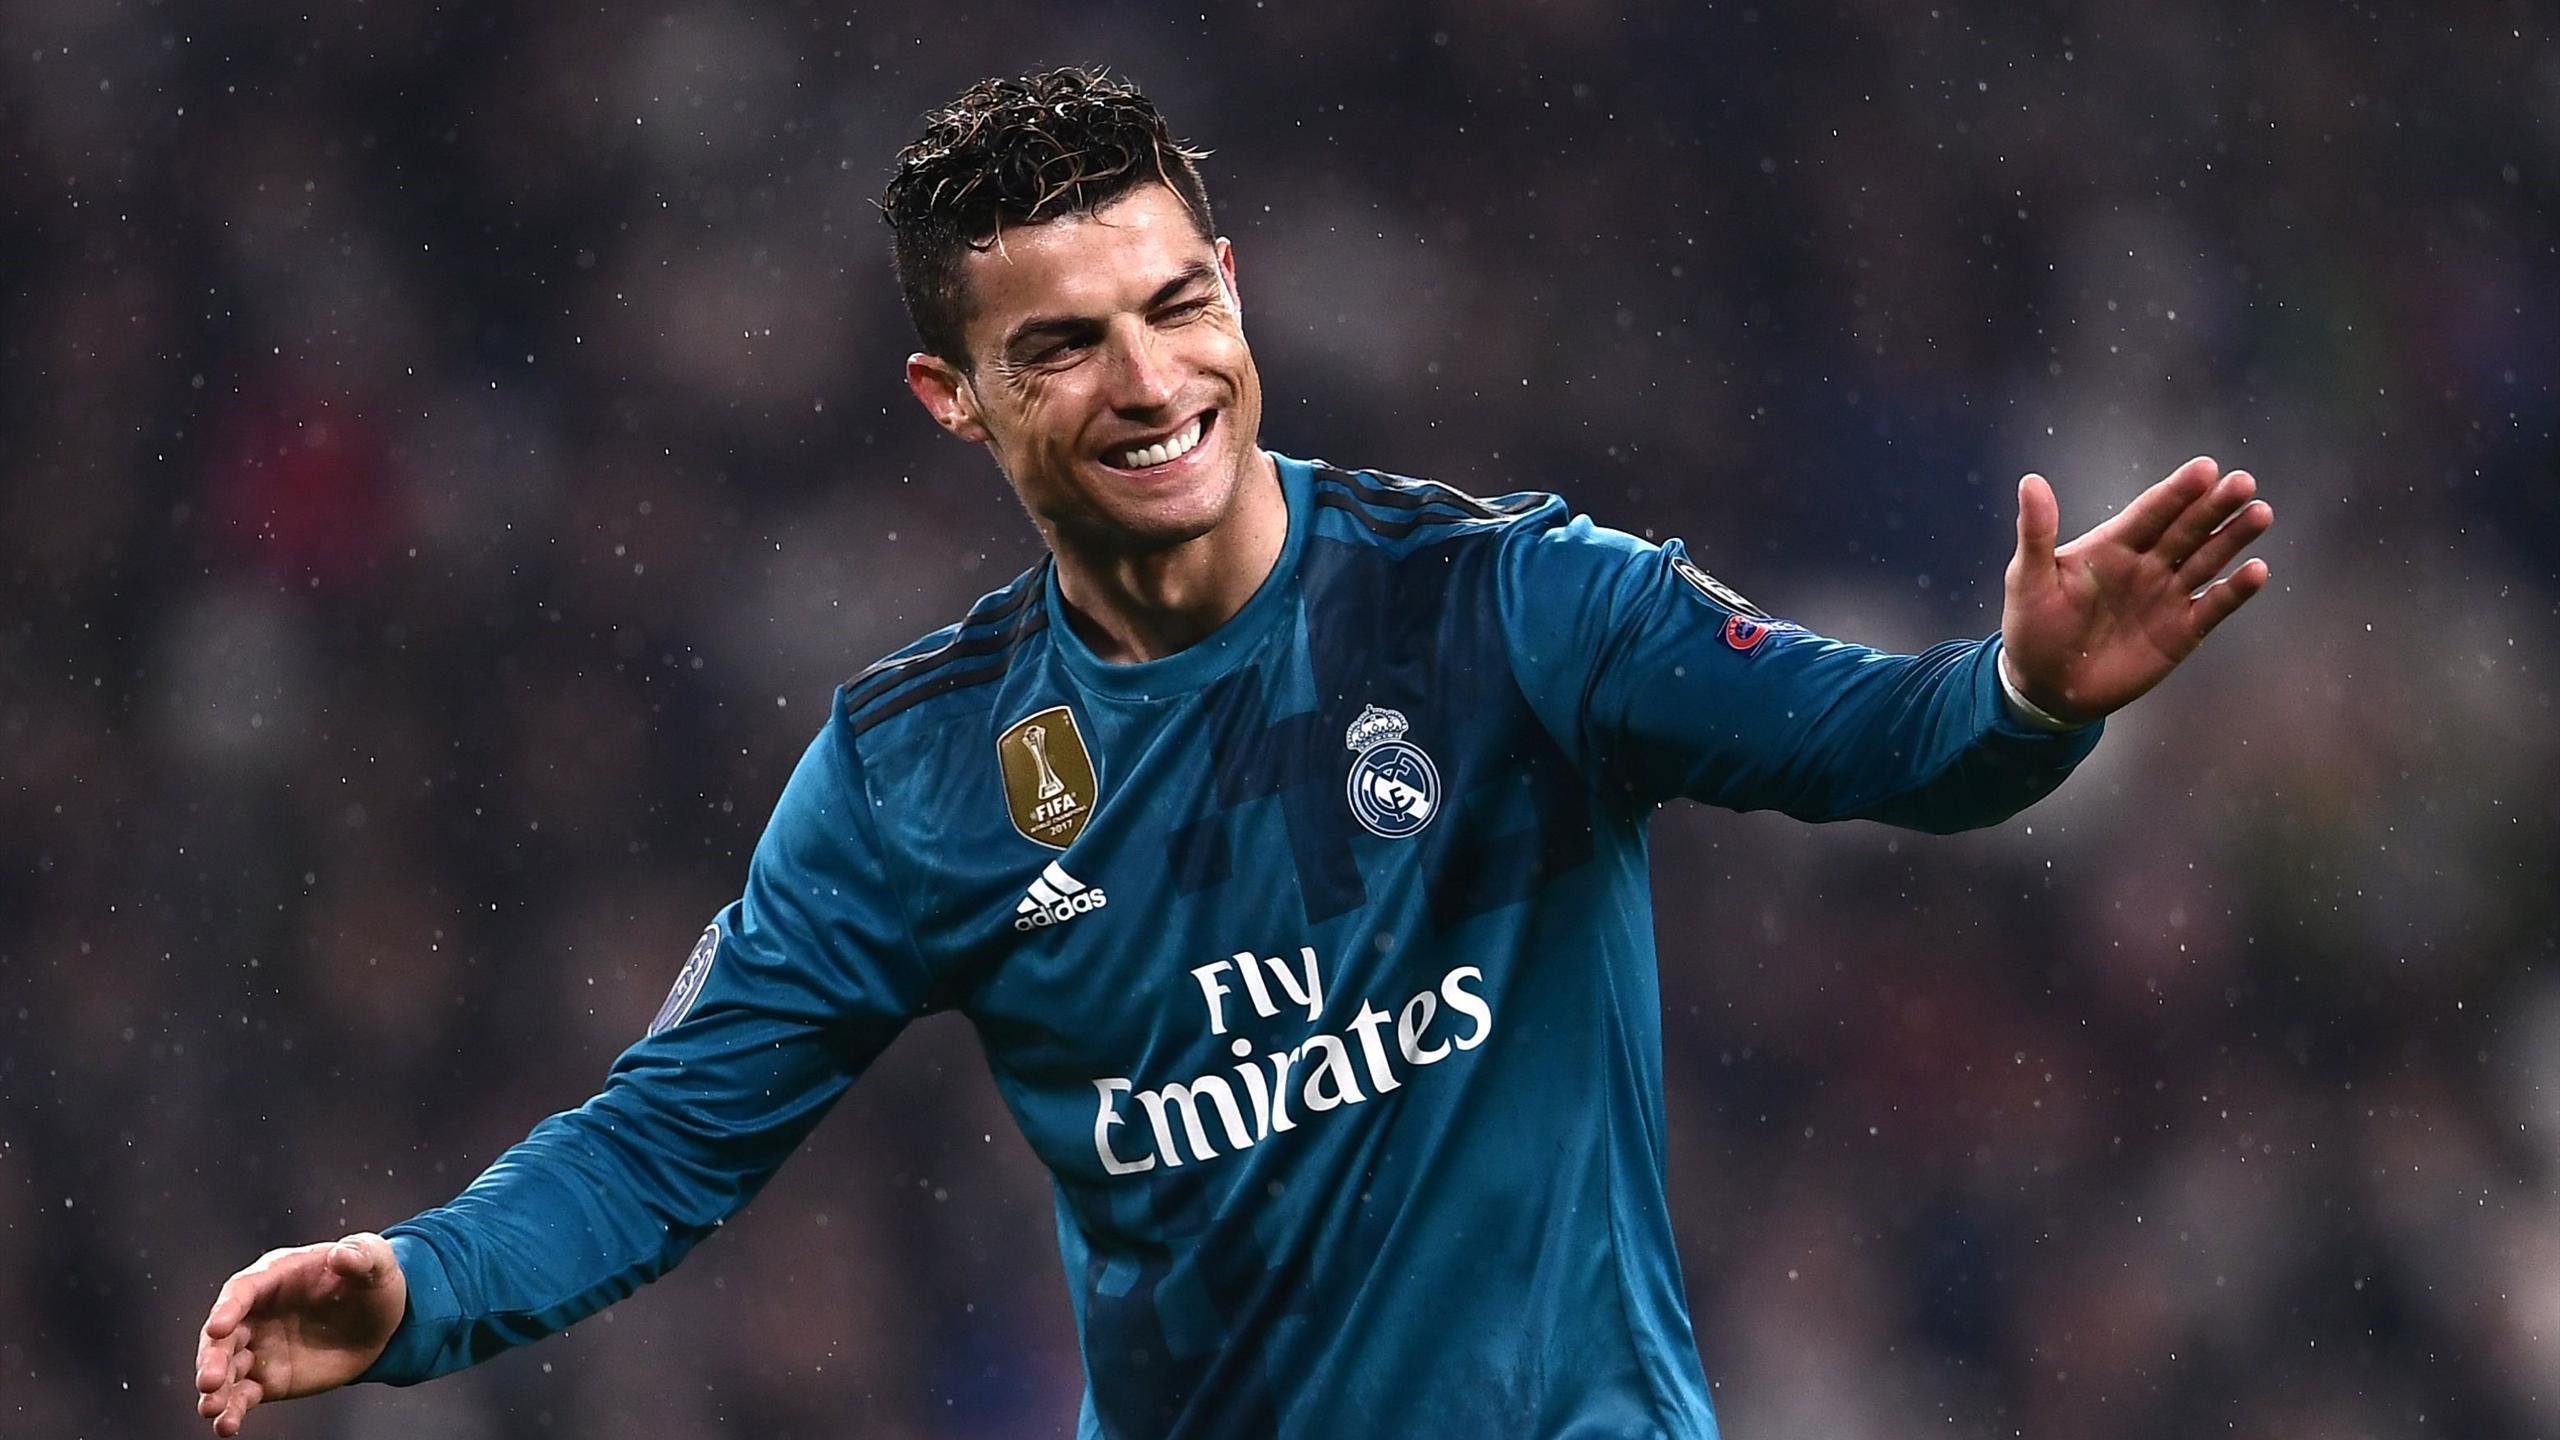 Remarkable Cristiano Ronaldo Runs The Show As Real Madrid Rout Juventus 3 0 Eurosport